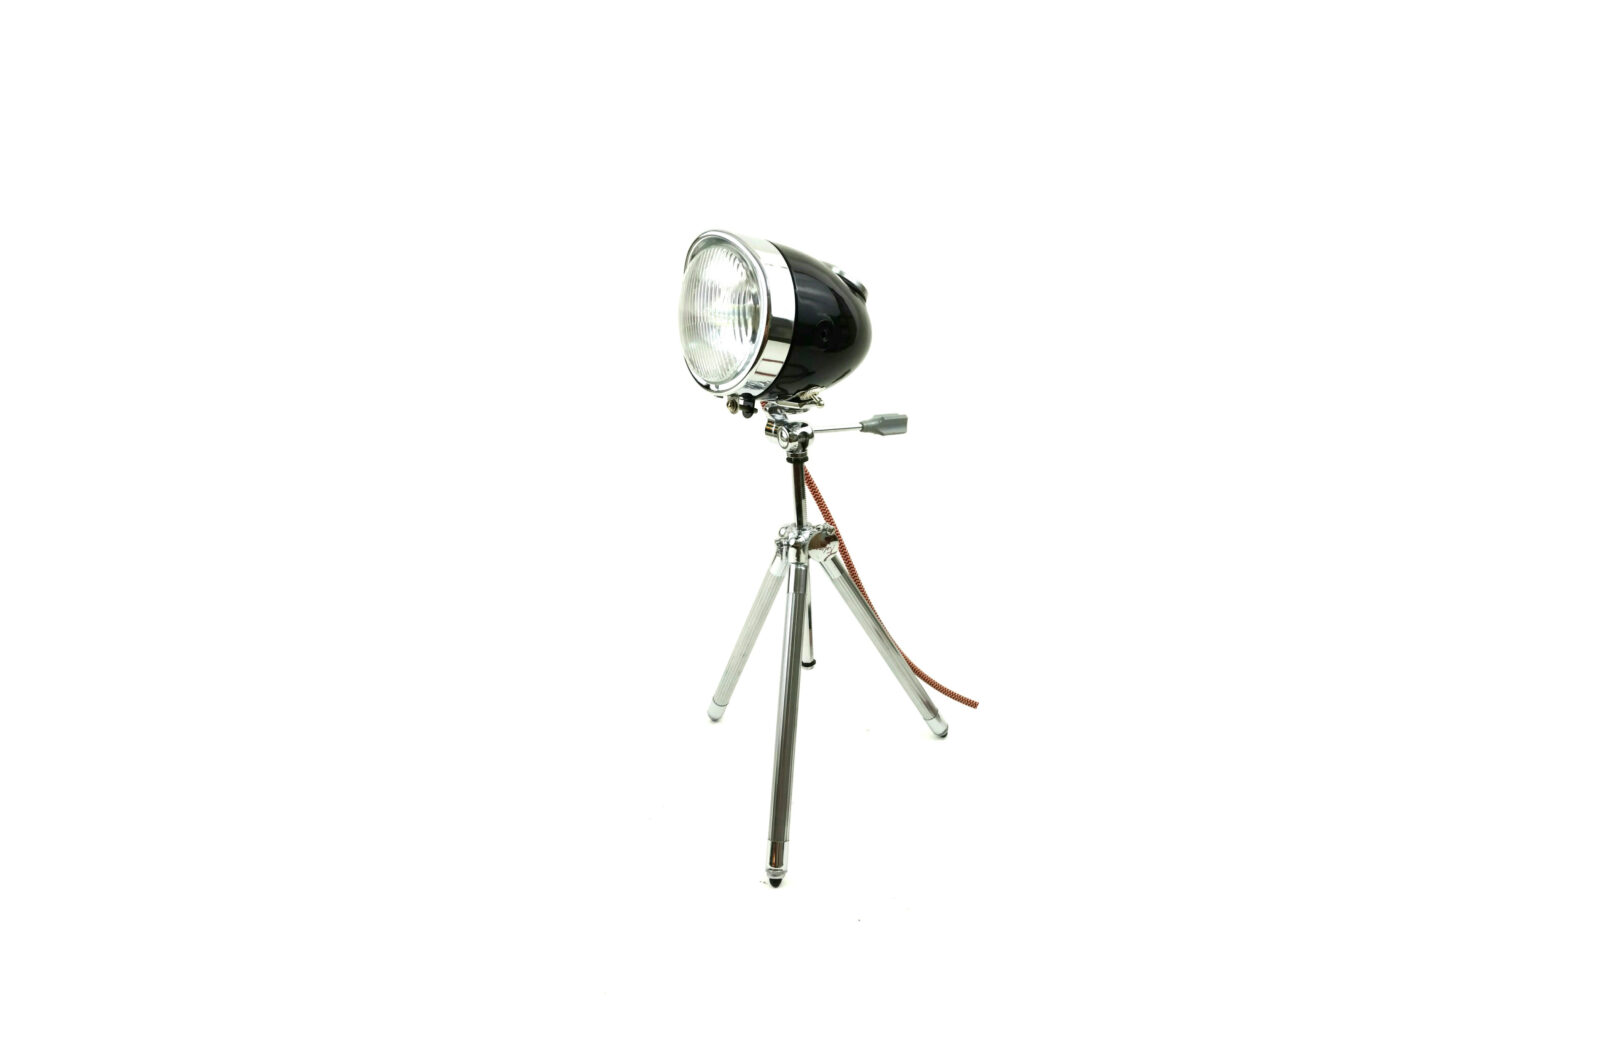 Scooter Headlight Desk Lamp Main 1600x1062 - Scooter Headlight Desk Lamp